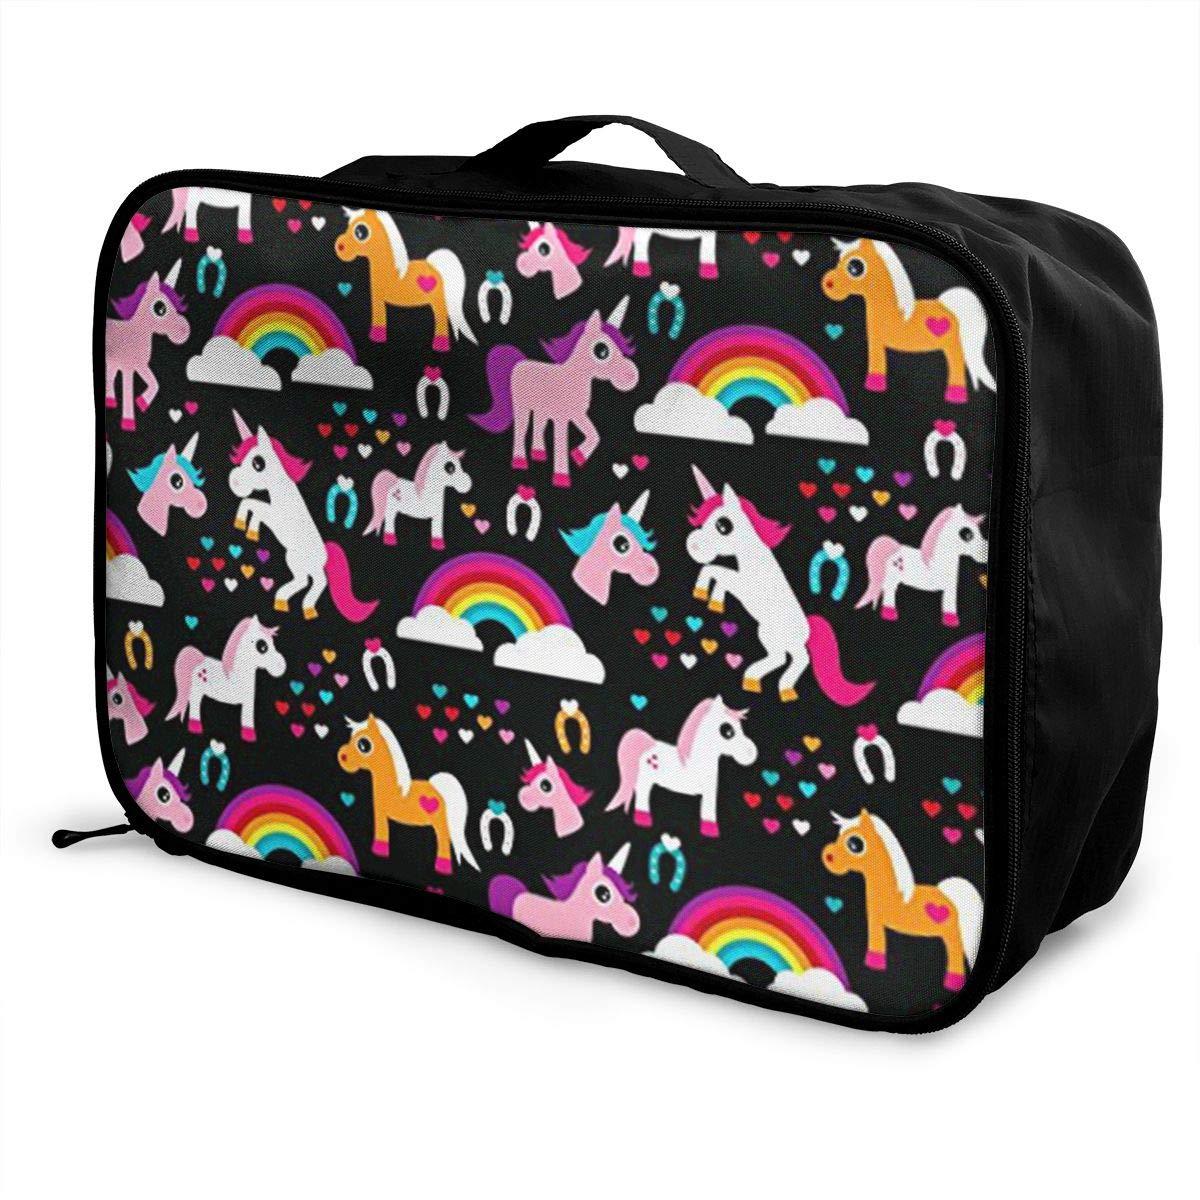 ADGAI Unicorn Rainbow Dream Adorable Horse Canvas Travel Weekender Bag,Fashion Custom Lightweight Large Capacity Portable Luggage Bag,Suitcase Trolley Bag